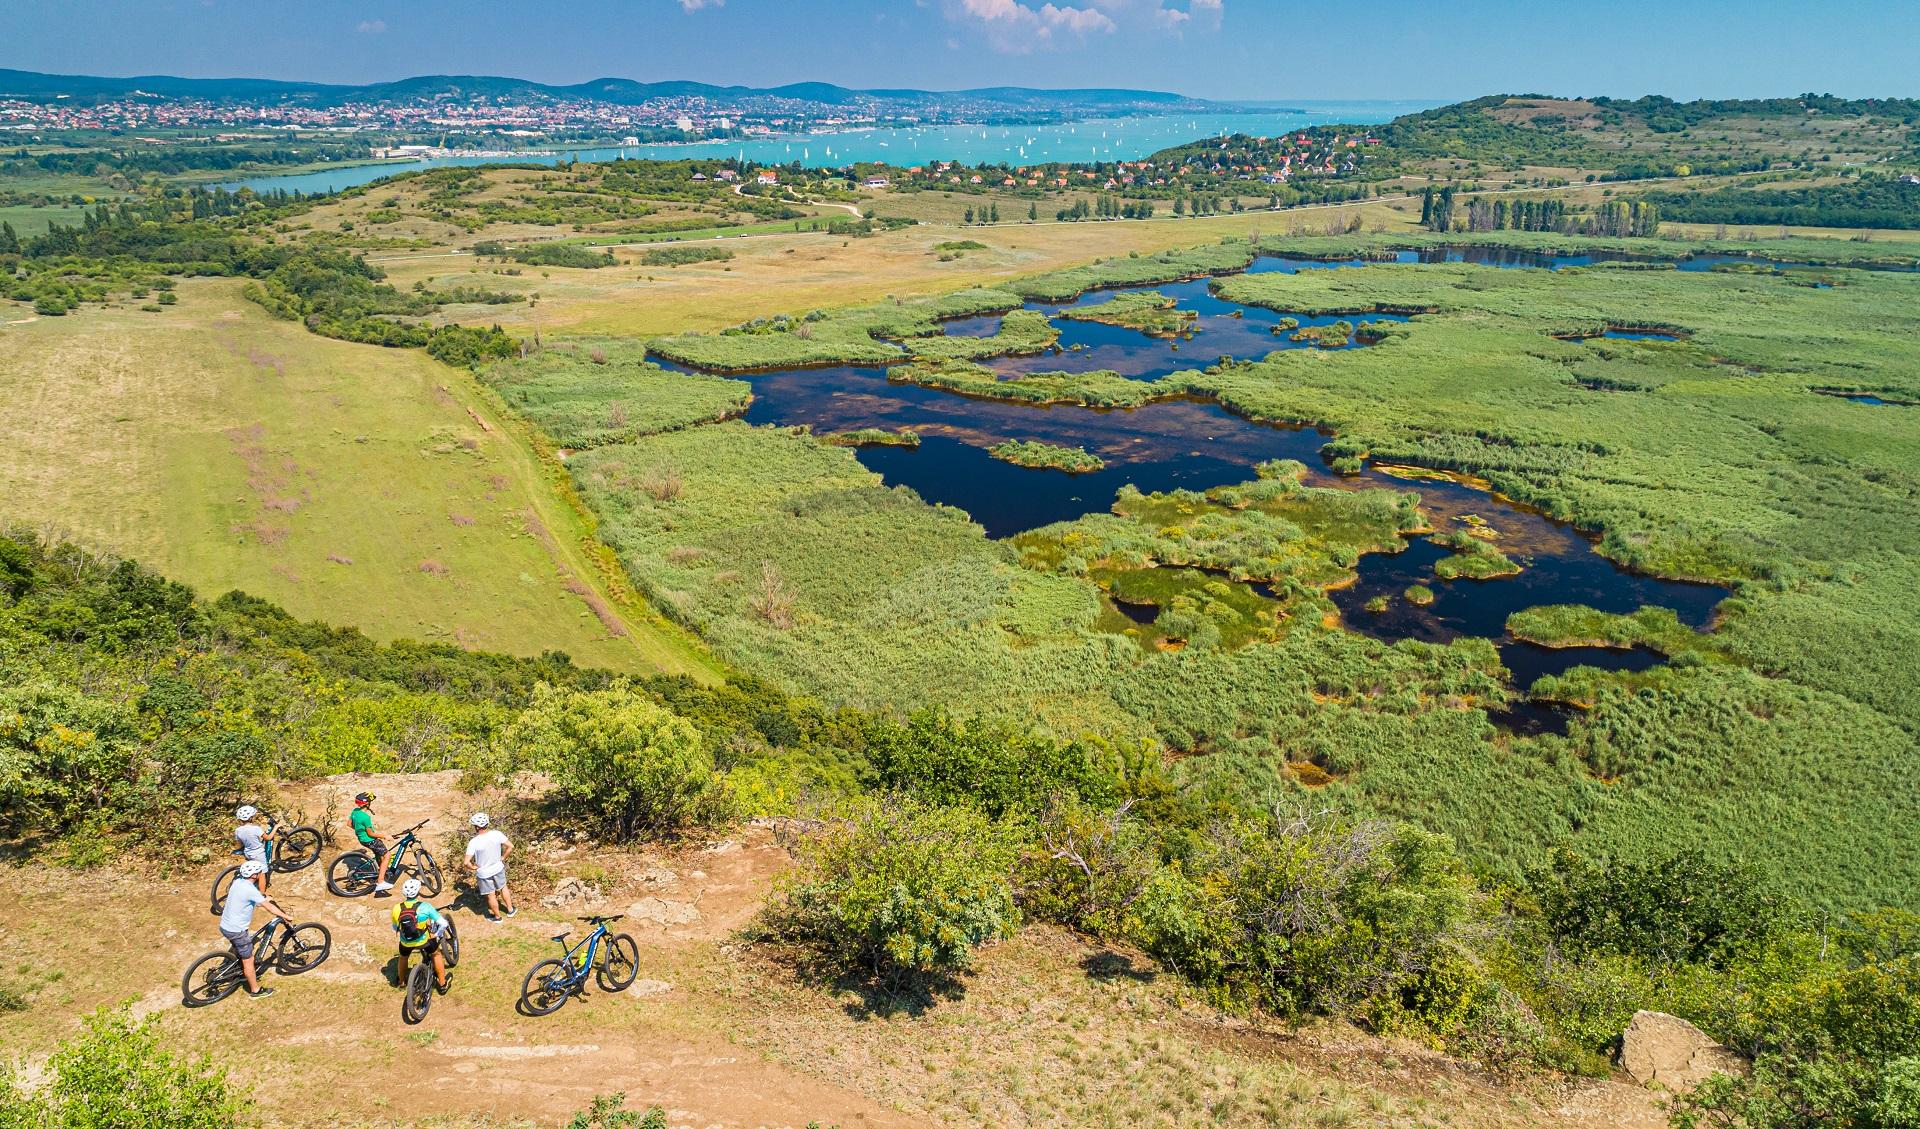 Kilátóról kilátóra piknikkel bolondítva a Balaton-felvidéken-2